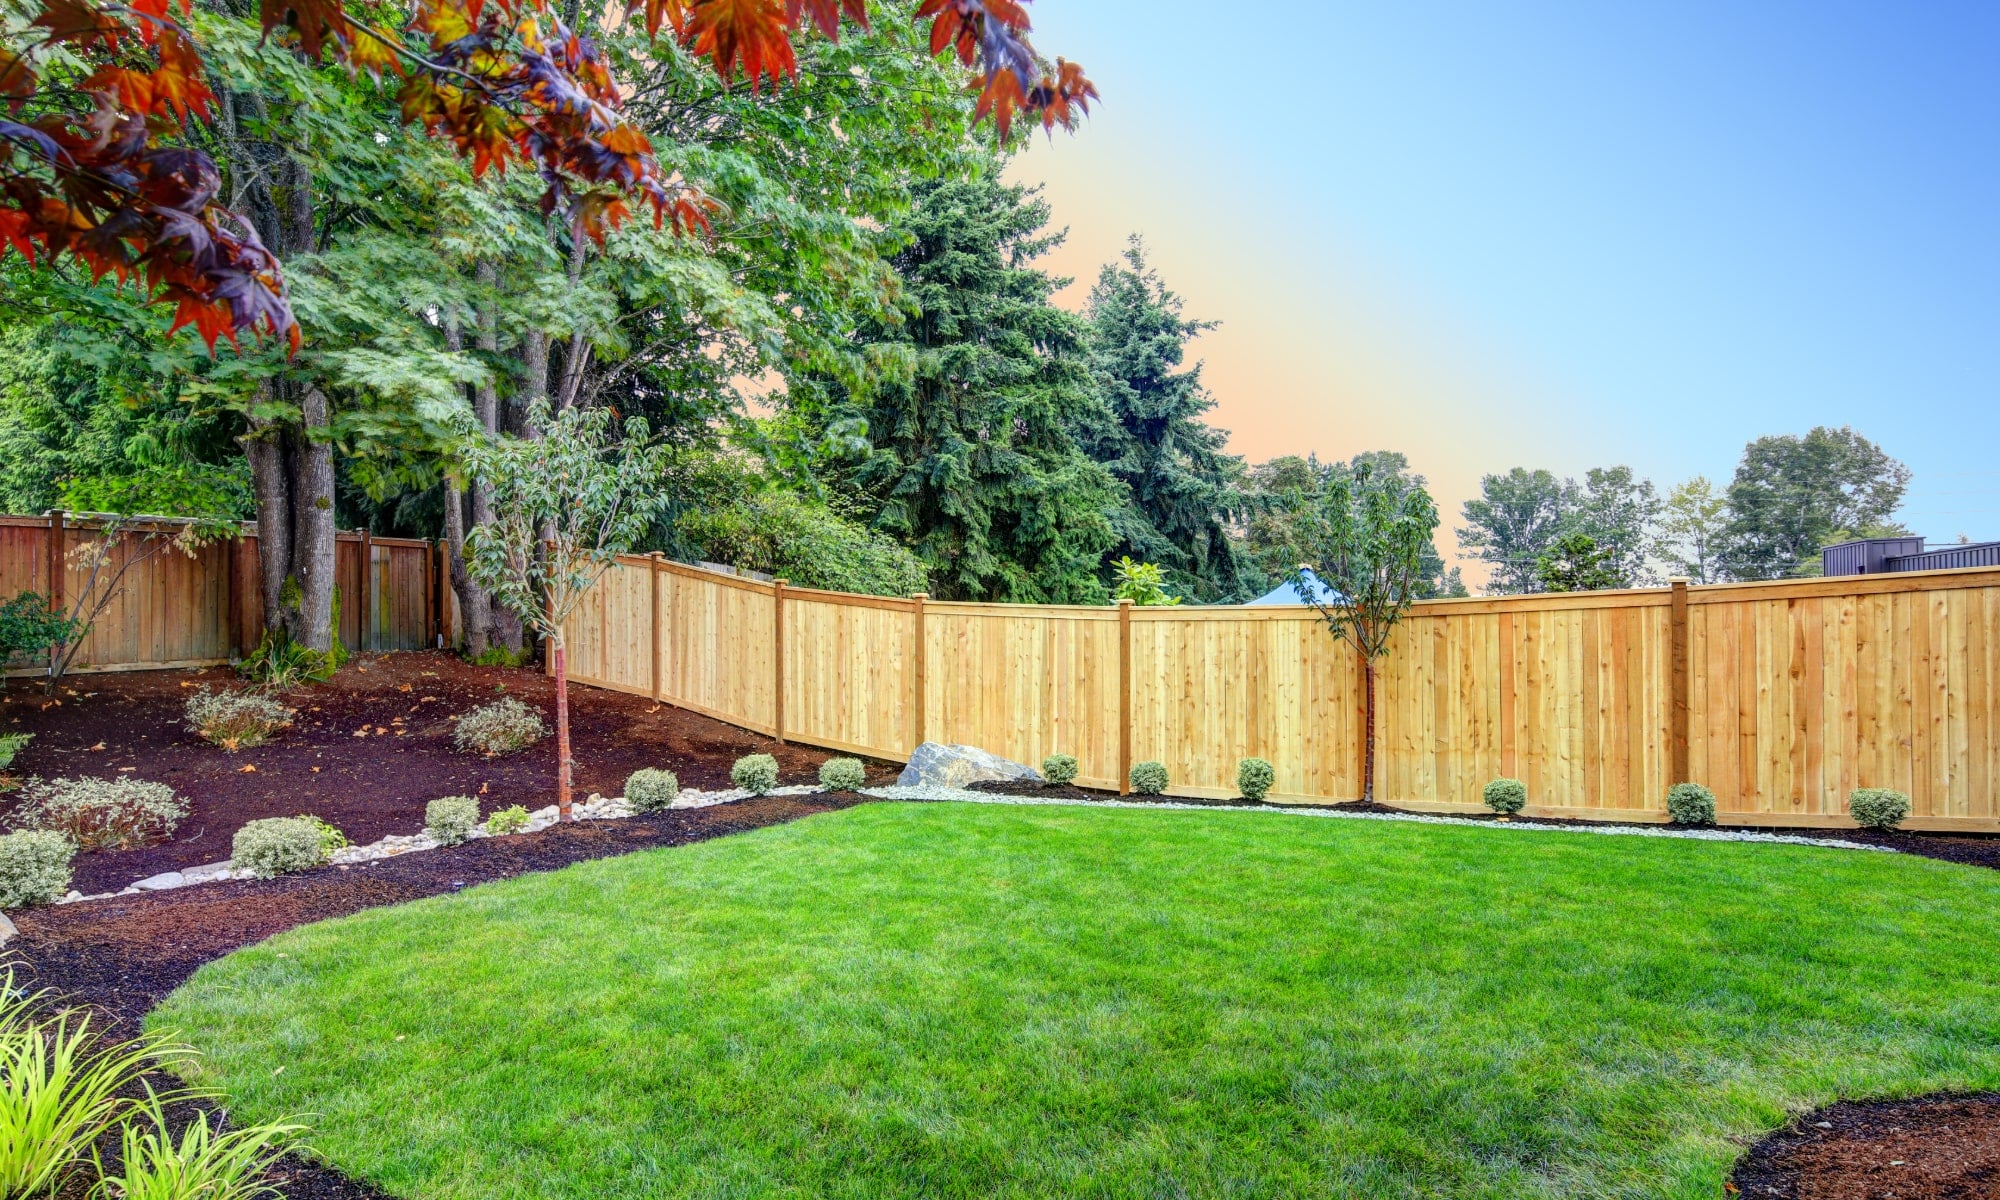 Top 5 Benefits of a Garden Fence